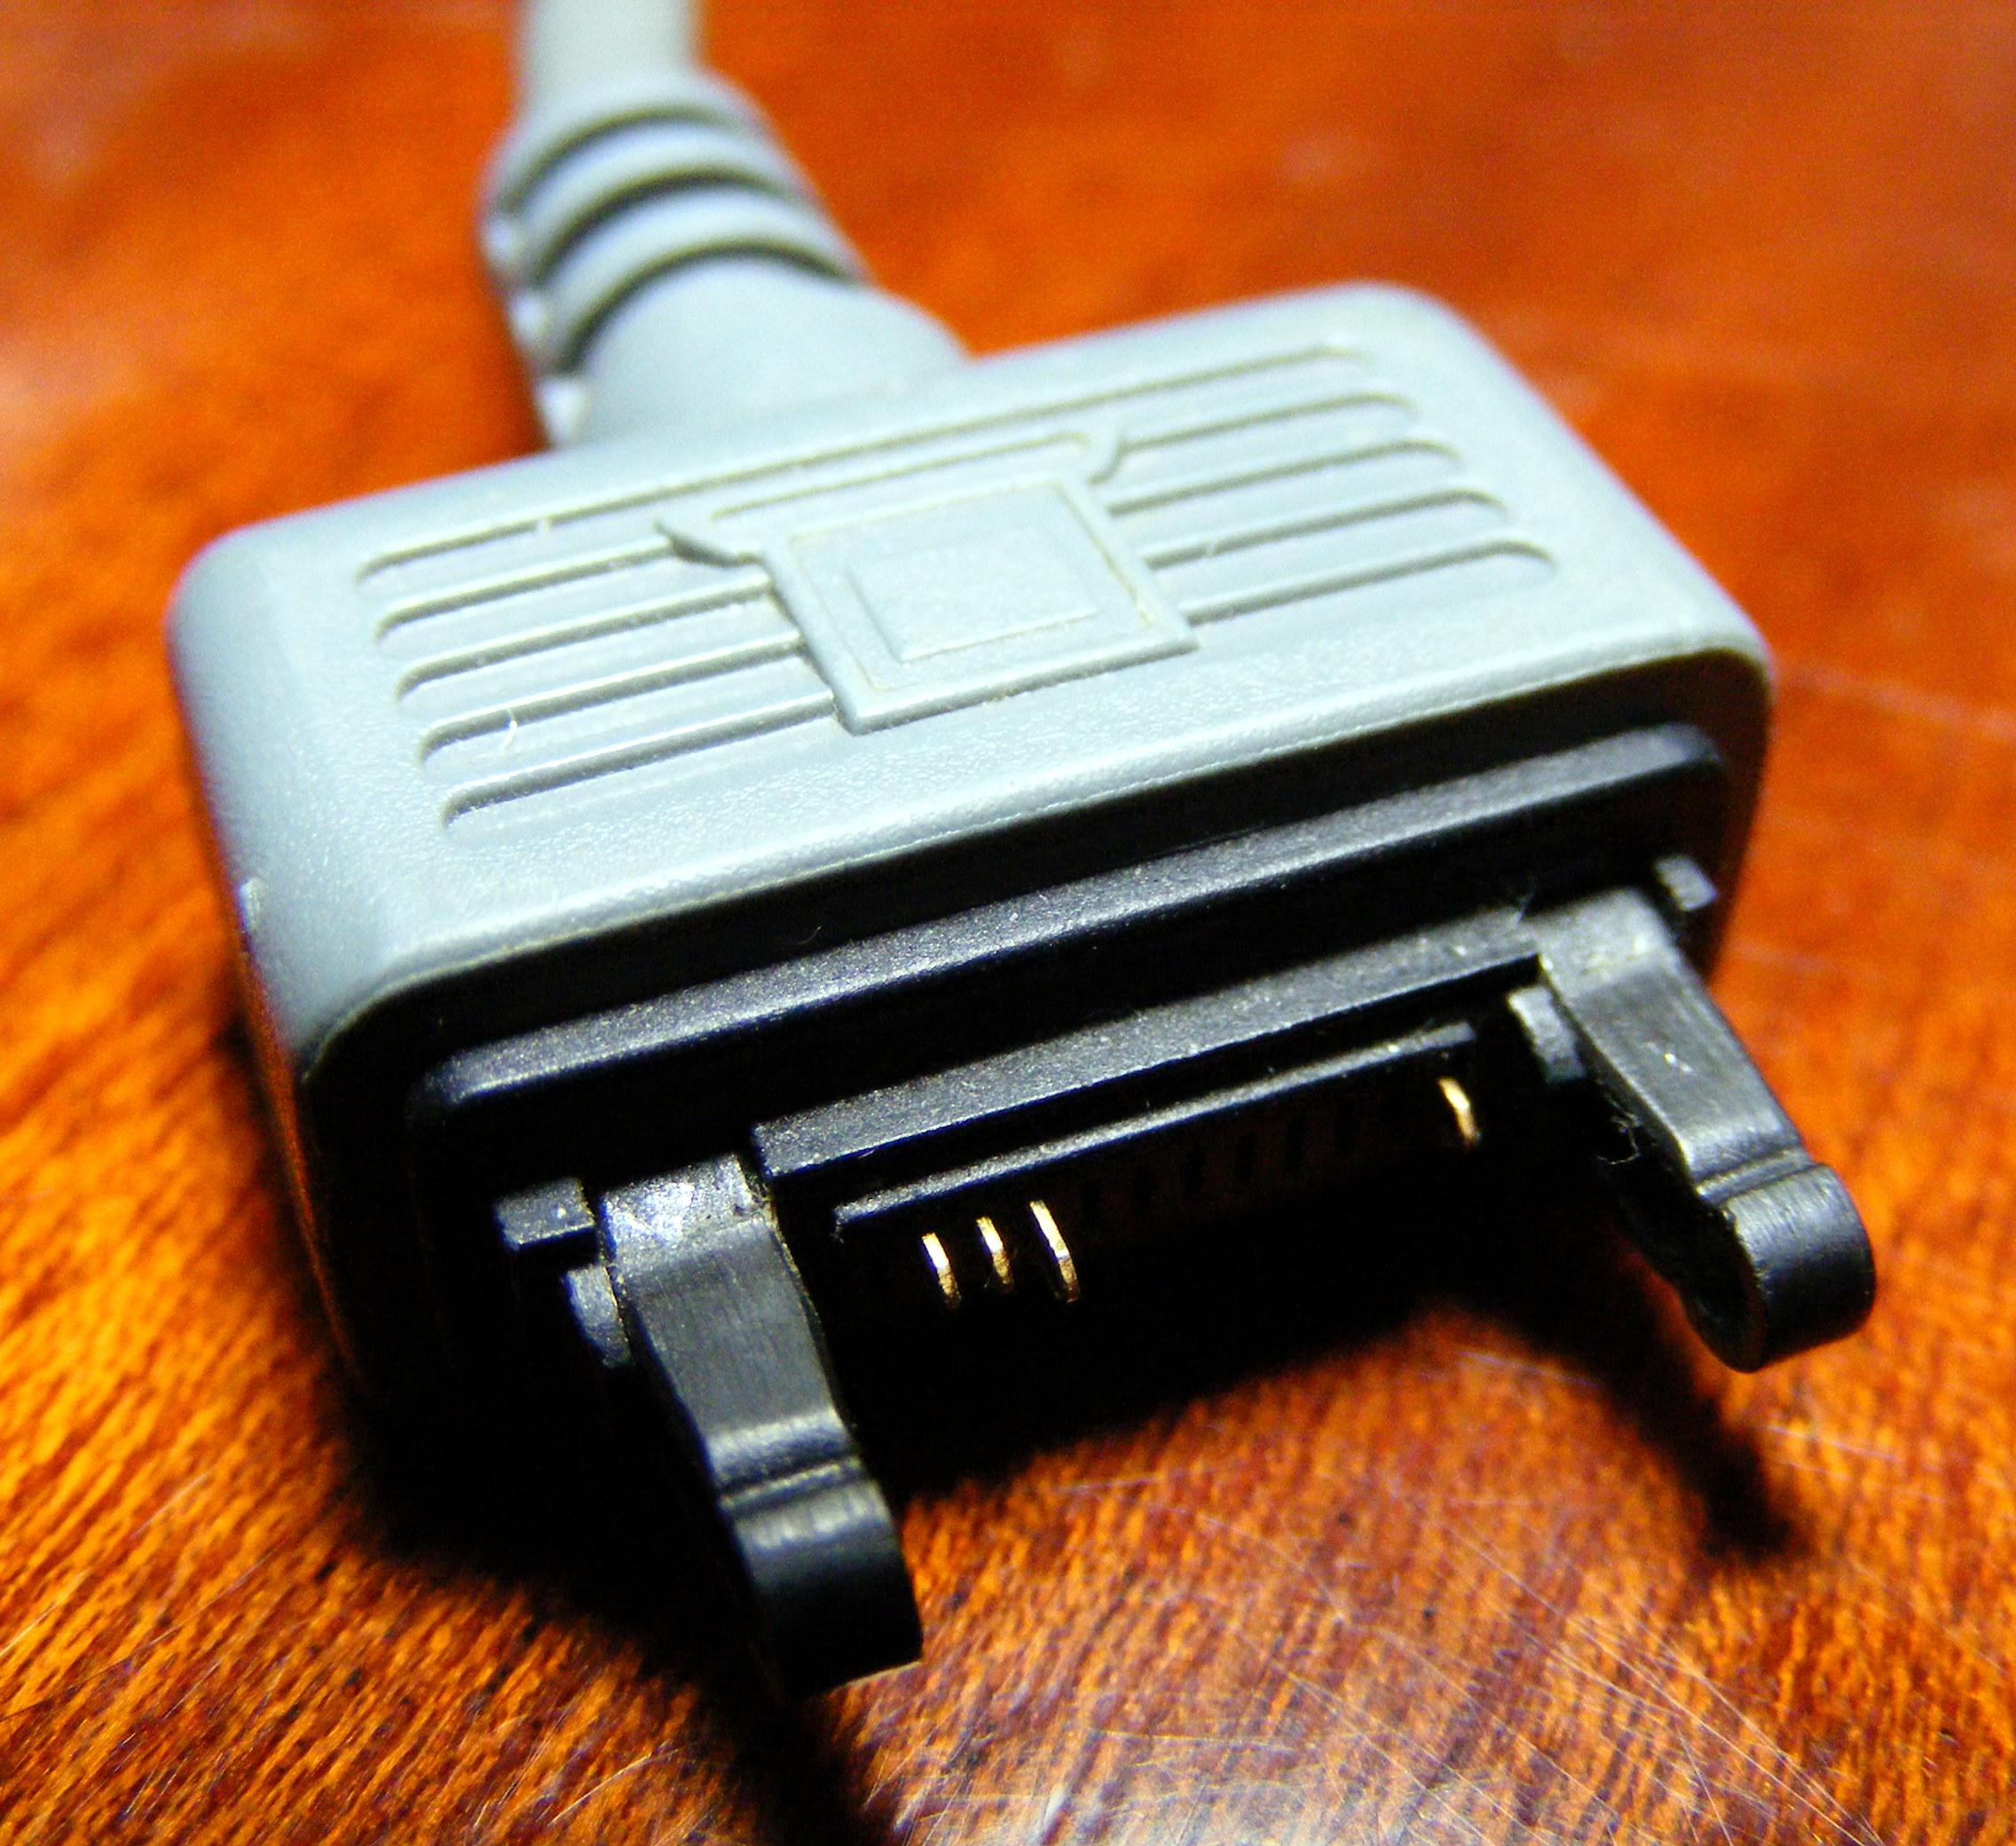 DCU-60 USB SOFTWARE DRIVER DOWNLOAD